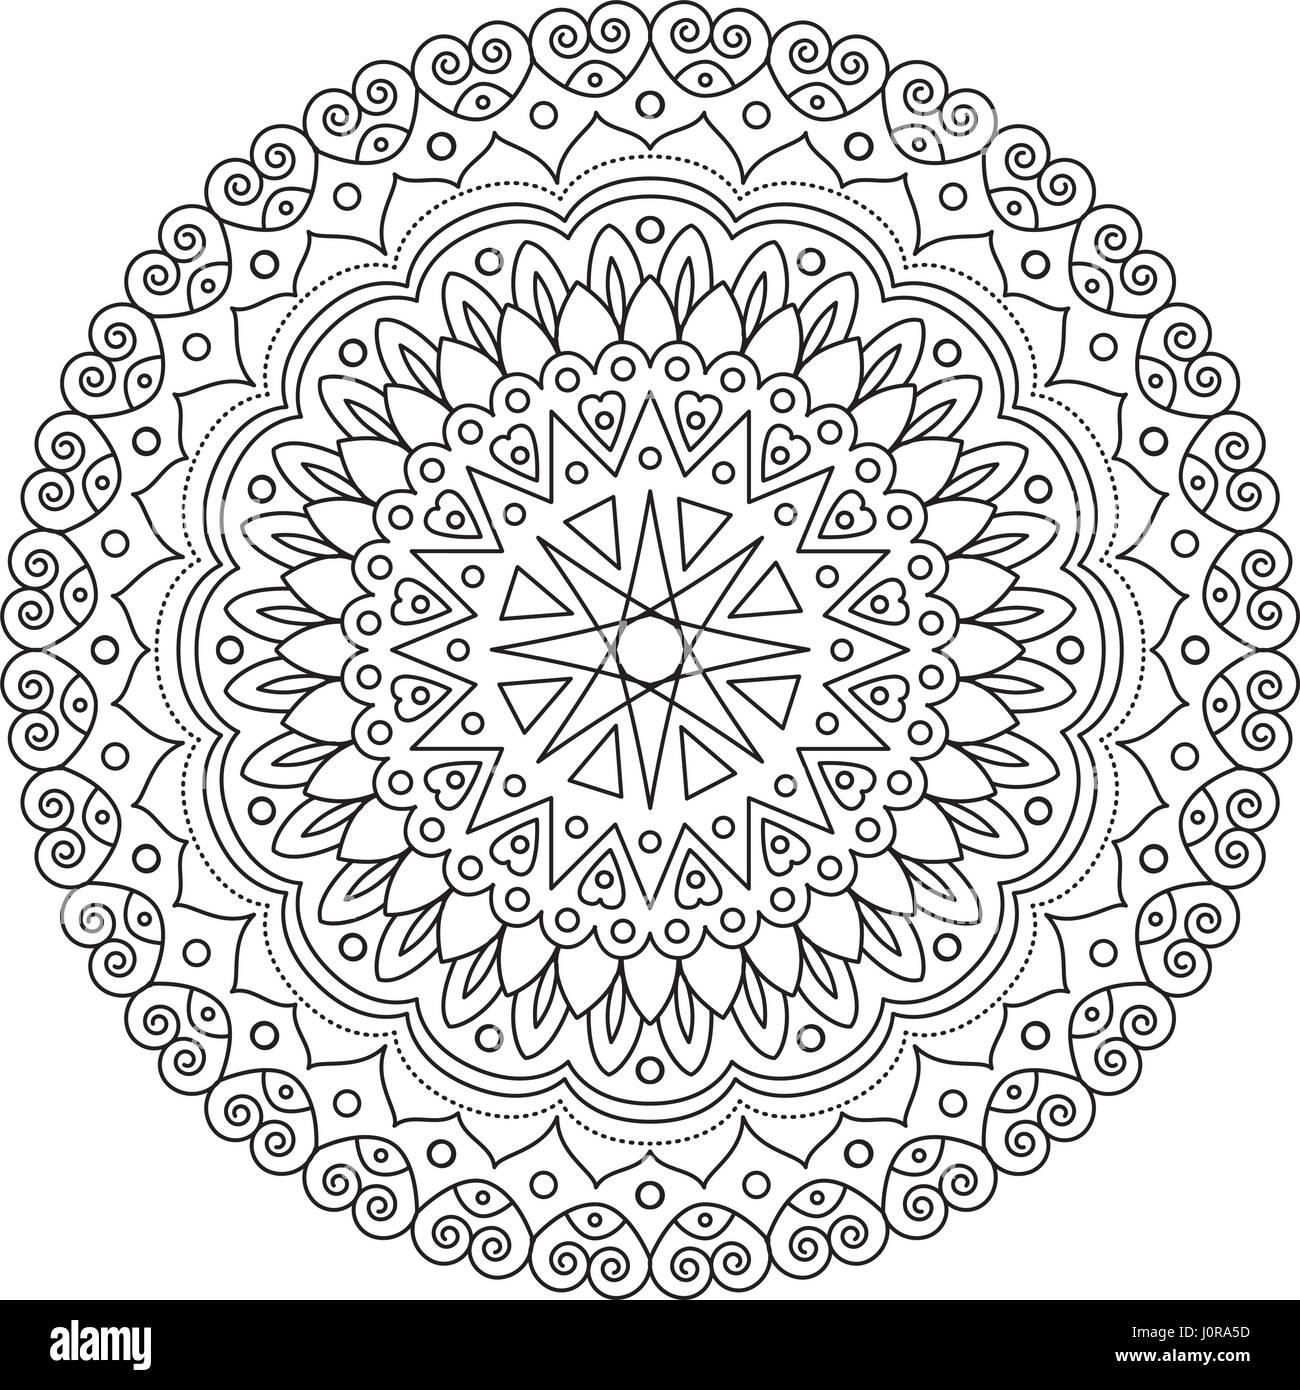 Coloring Book Mandala. Kreisen Sie Spitze Ornament, rundem ...